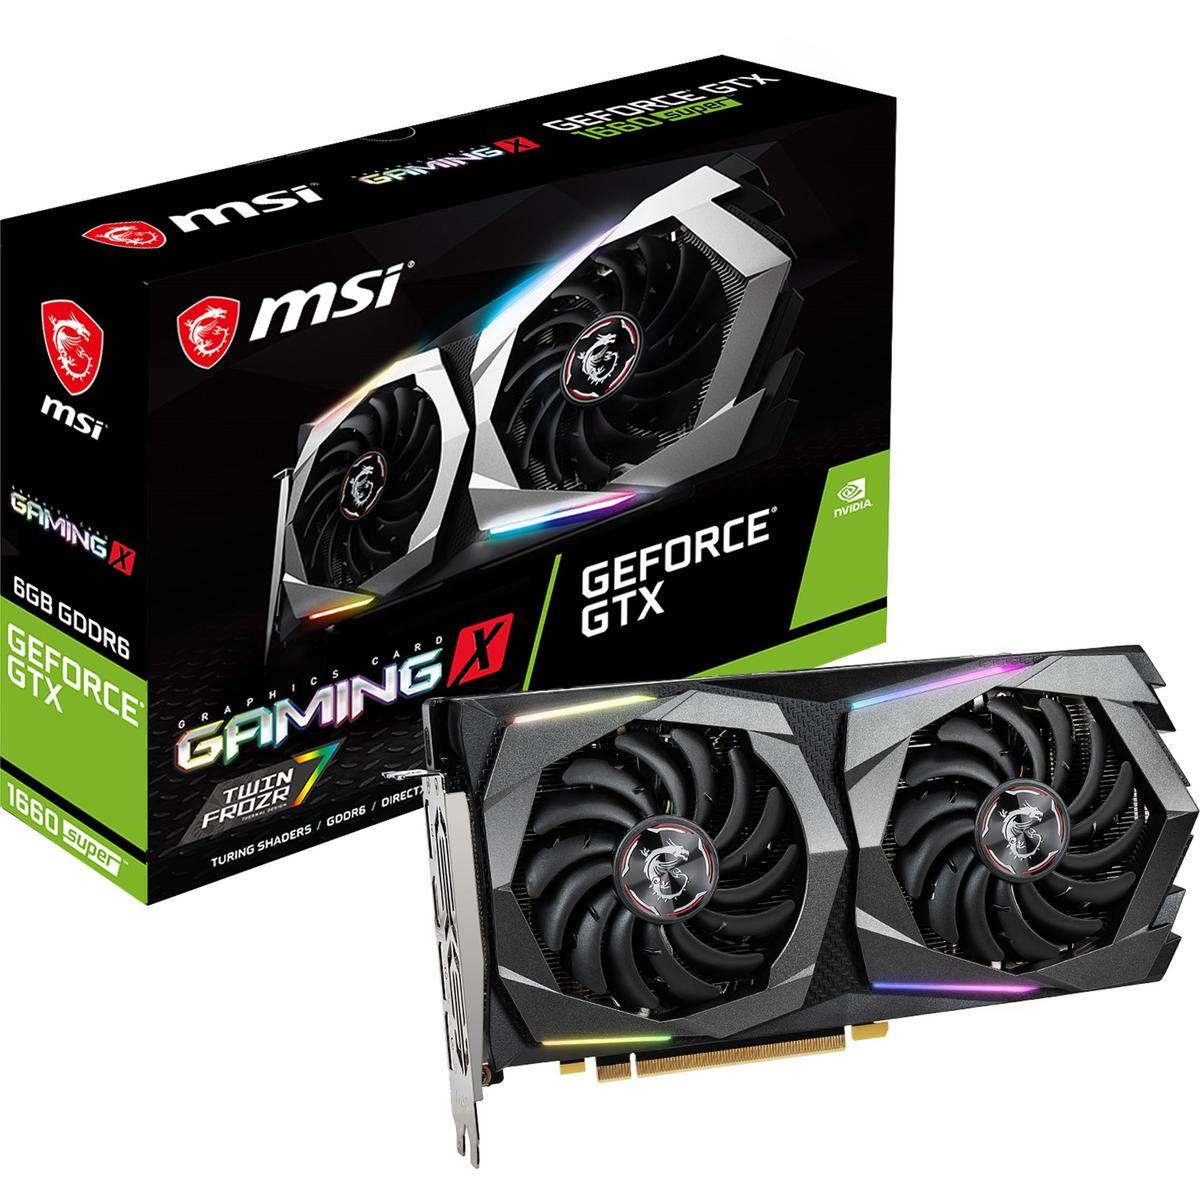 MSI GeForce GTX 1660 SUPER 6 GB GAMING X Video Card